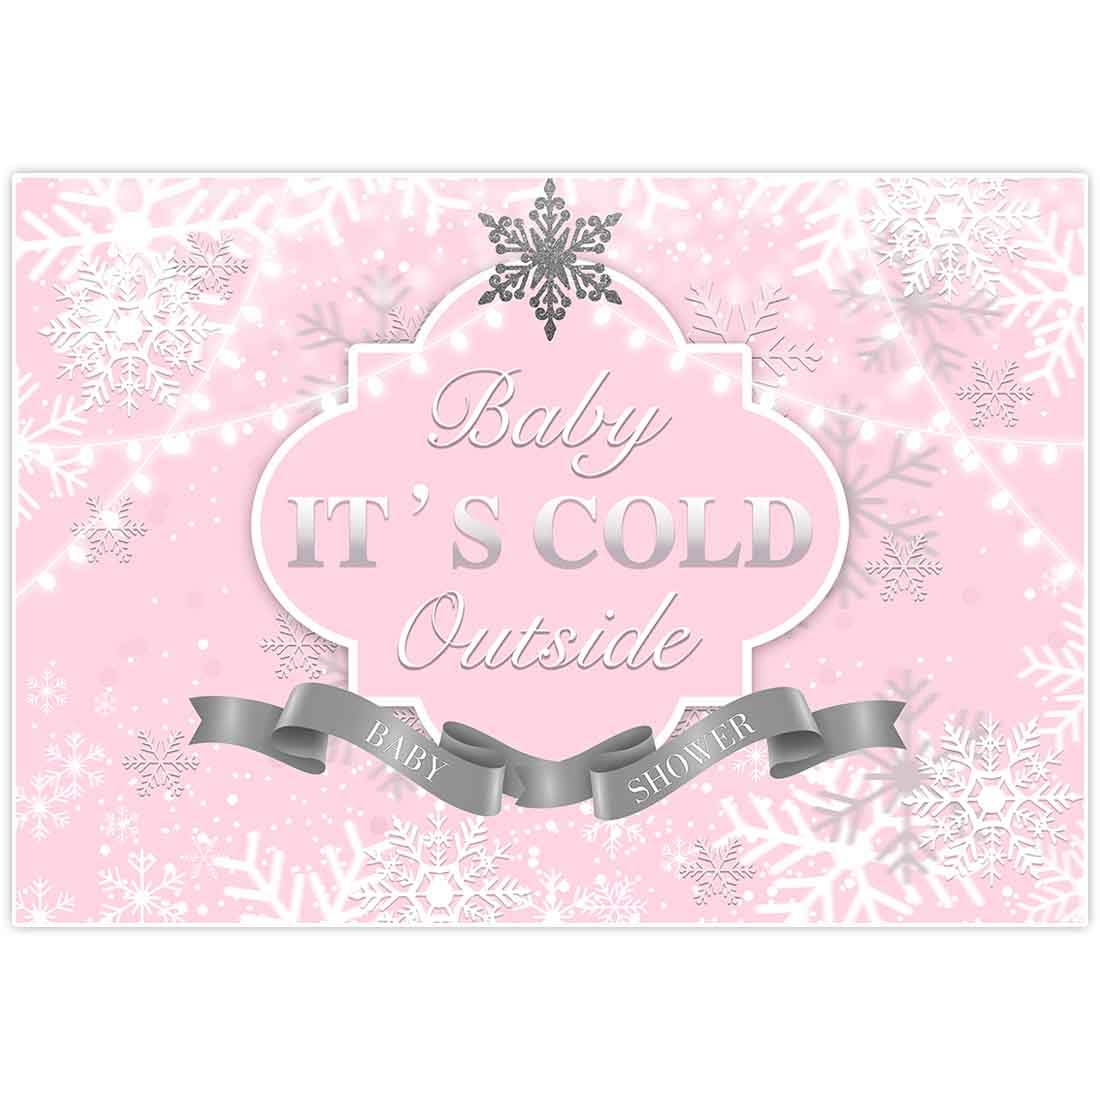 Allenjoy 7x5ft Baby It's Cold Outside Backdrop Winter Wonderland Girl Princess 1st Birthday Baby Shower Baptism Pink Sliver Snowflake Sparkle Glitter Photography Background Banner Decorations Props